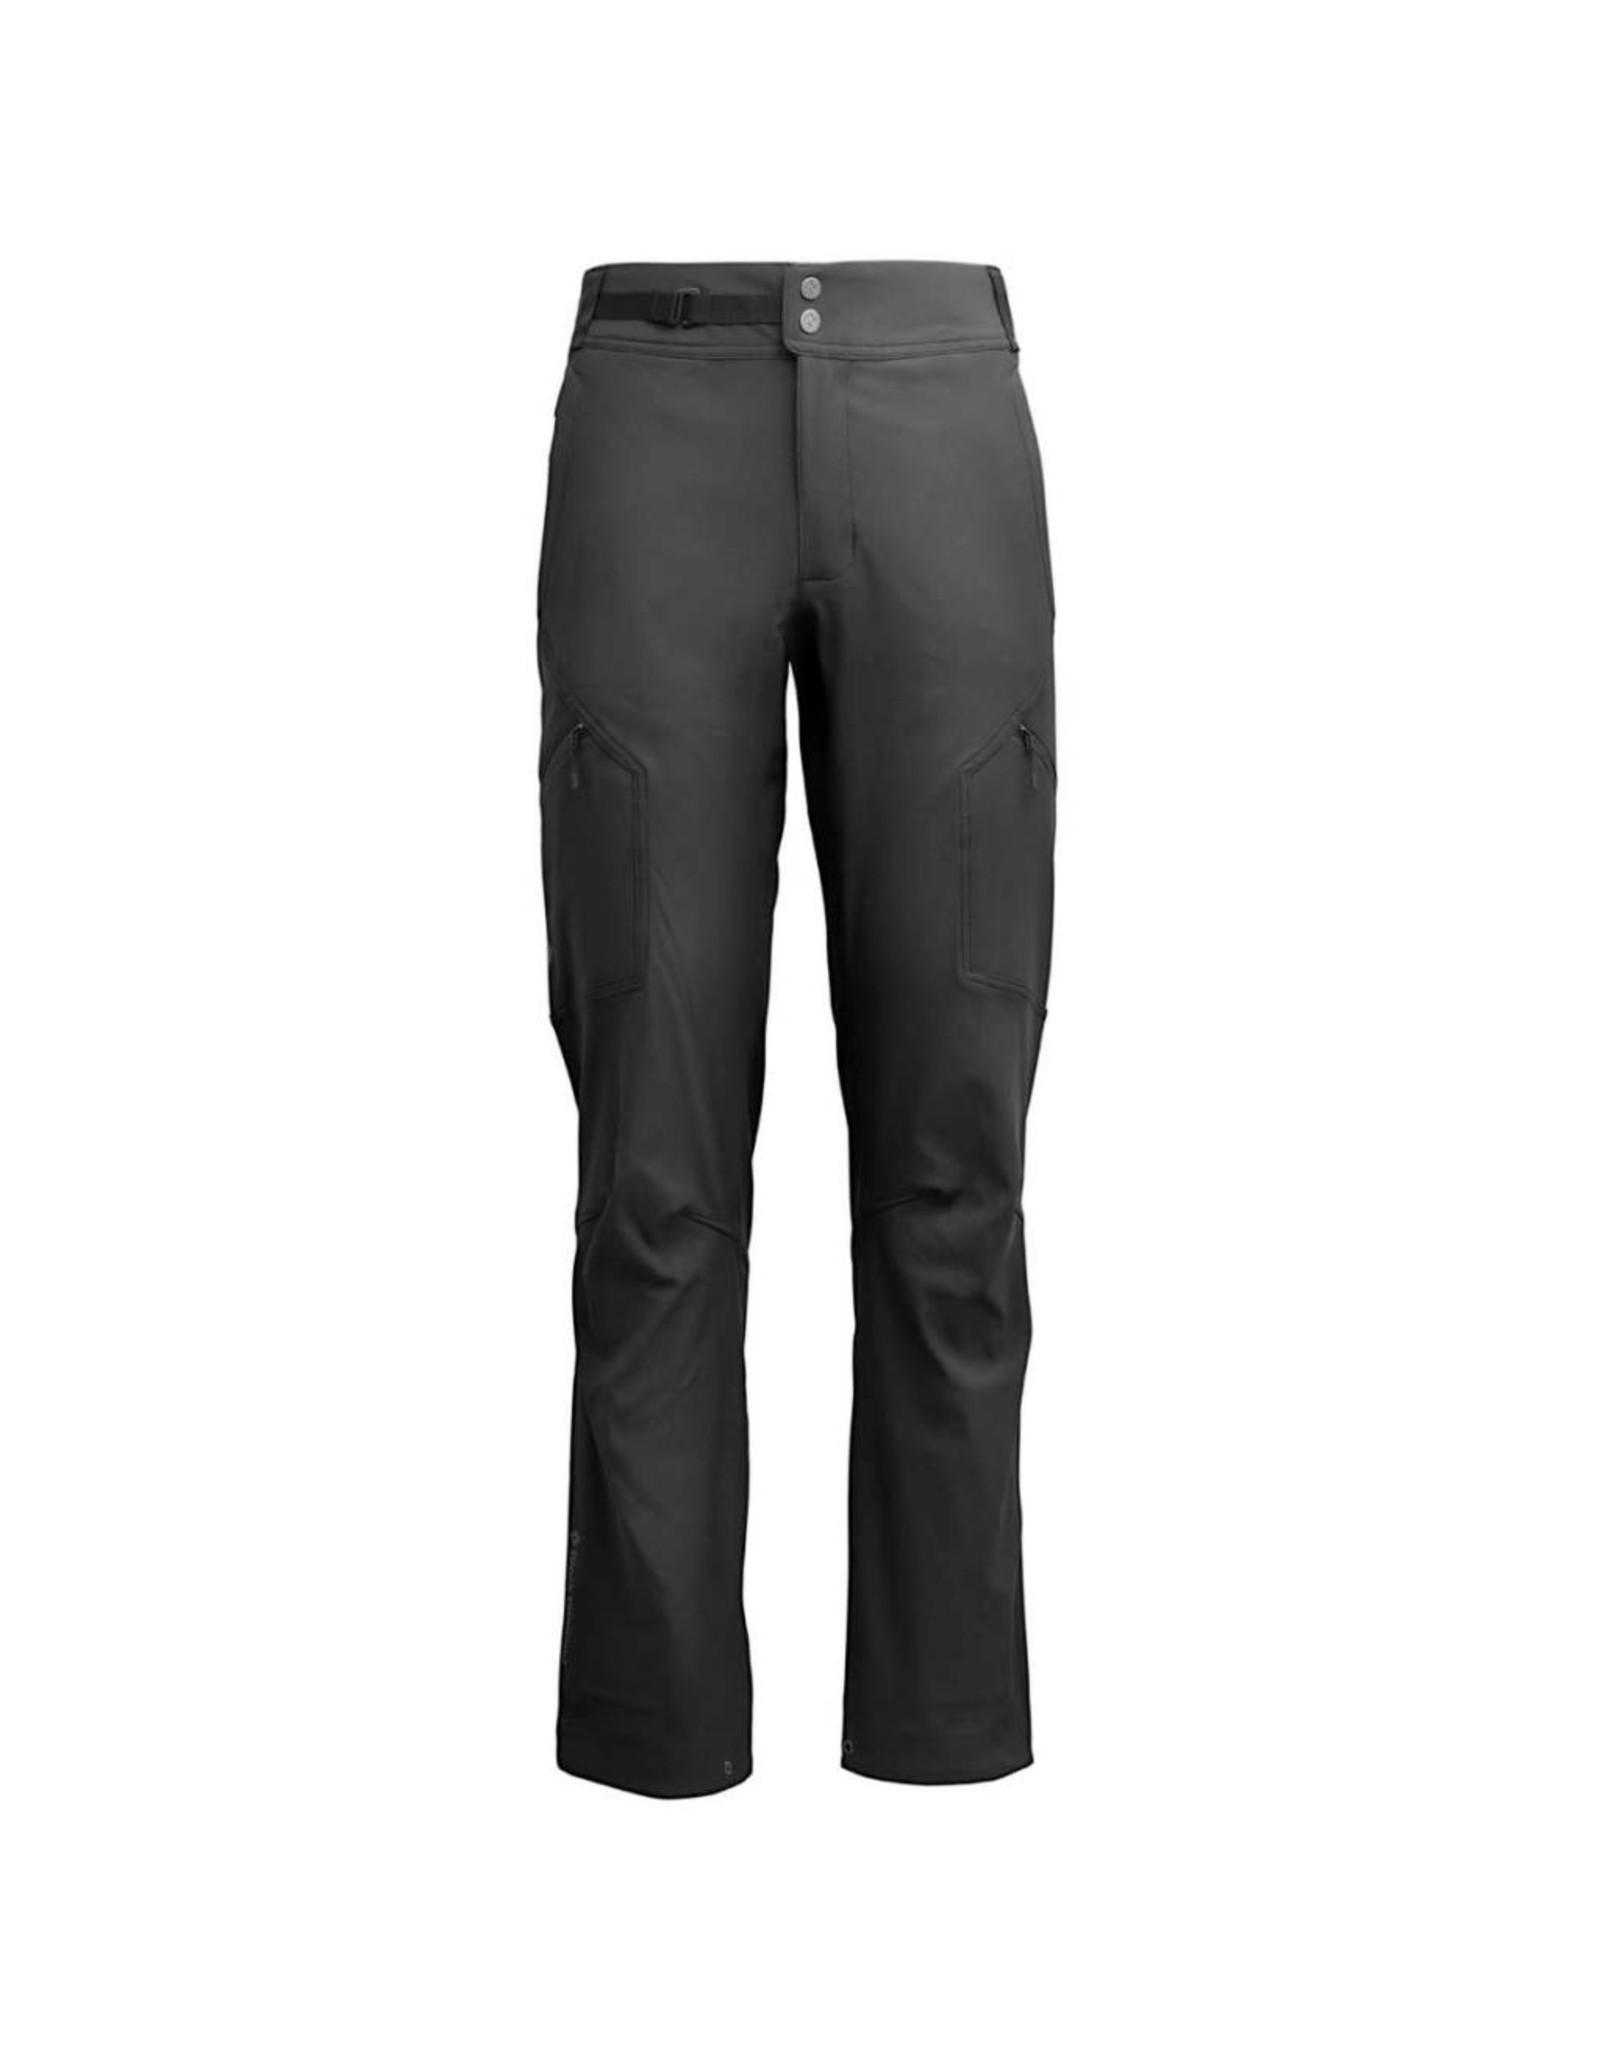 Black Diamond Black Diamond Alpine Winter Pants - Men